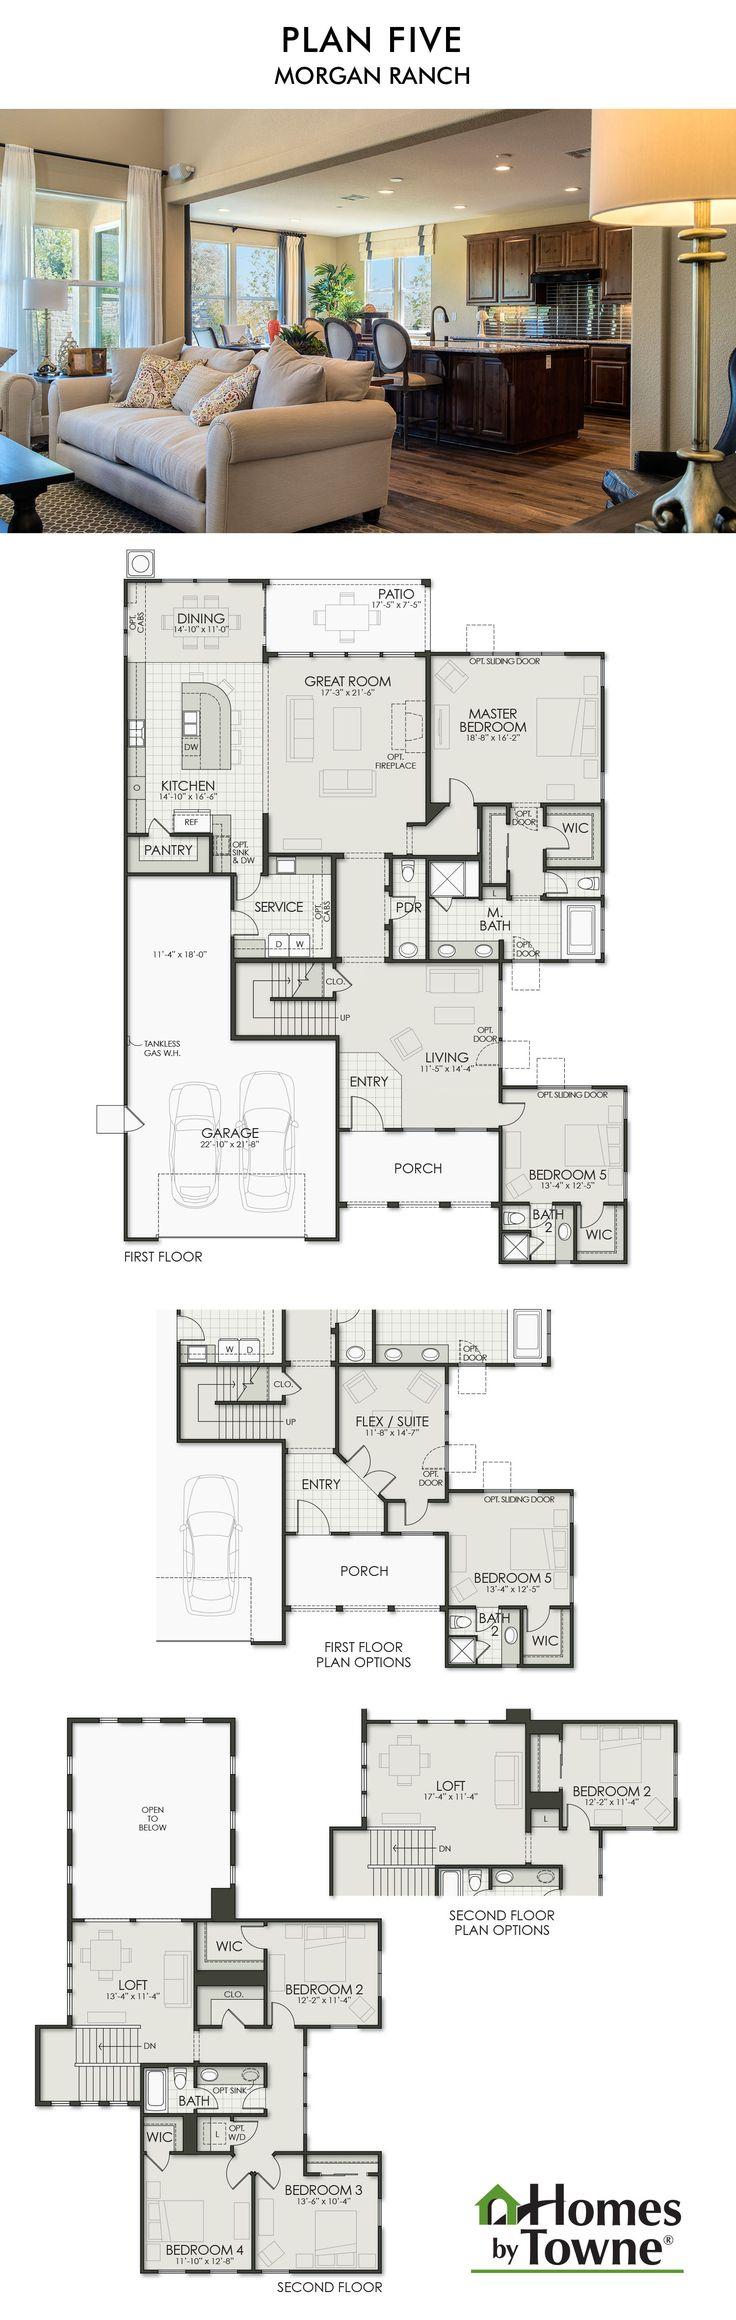 Plan Five Morgan Ranch Roseville California Homes